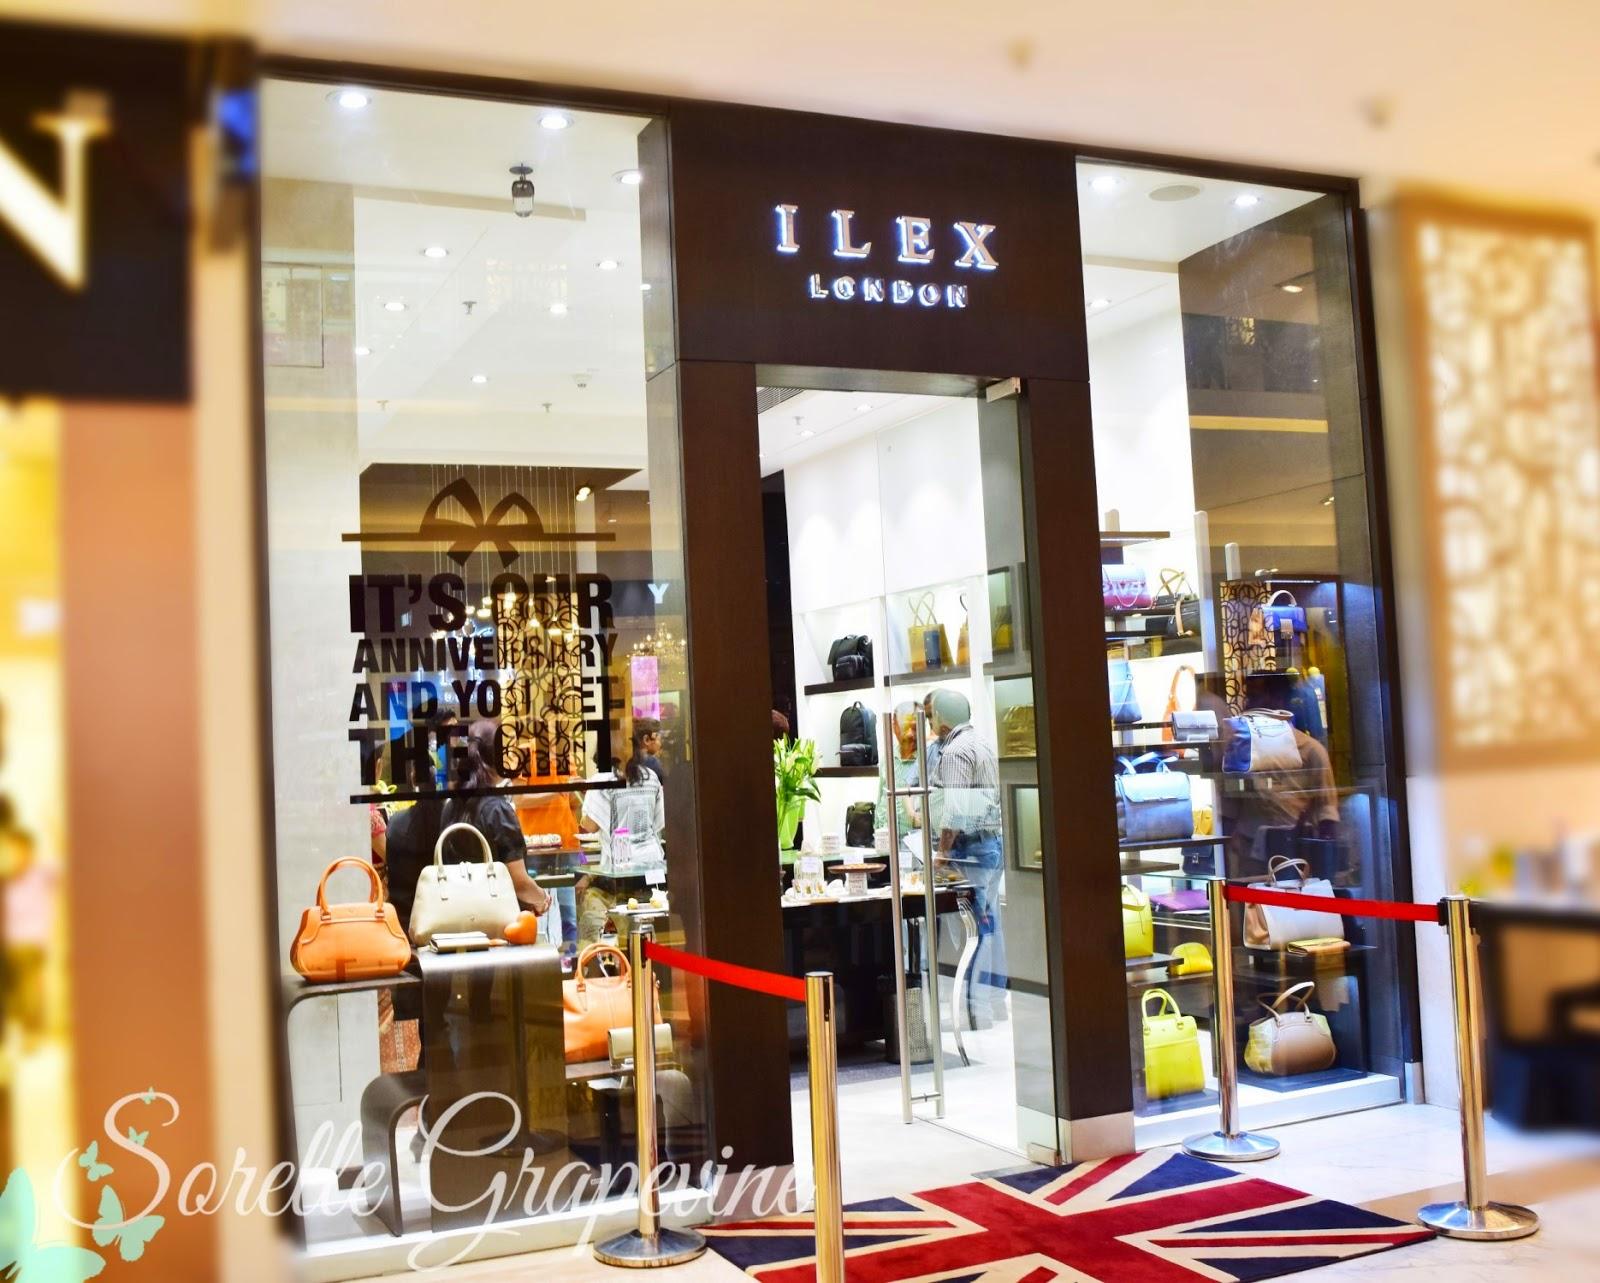 ILEX London